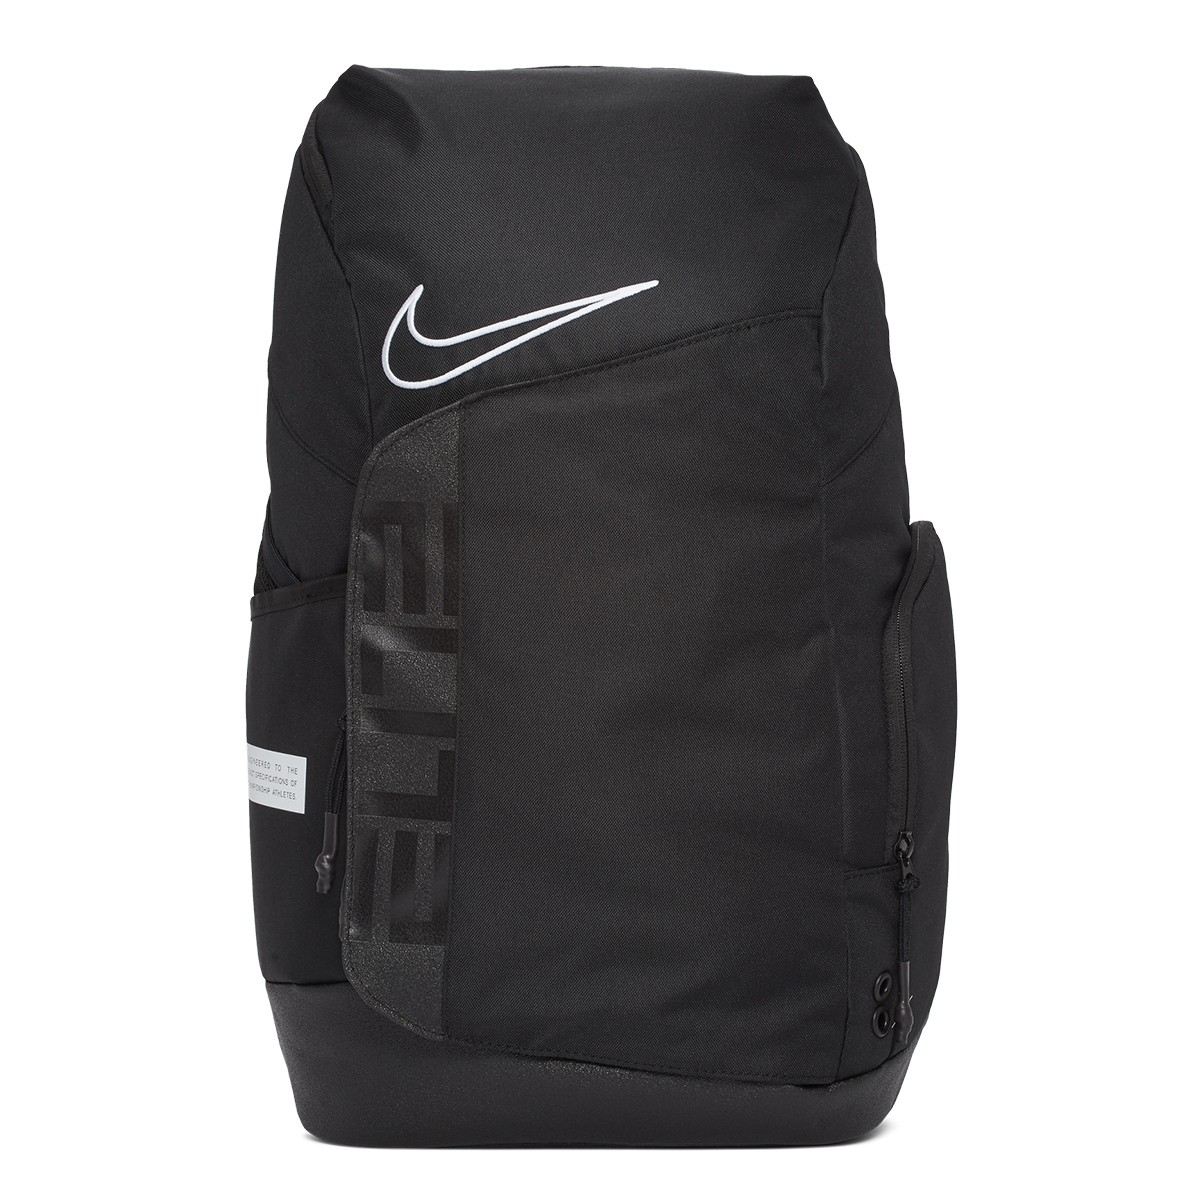 Nike Hoops Elite Pro Backpack 'Black Graphite'